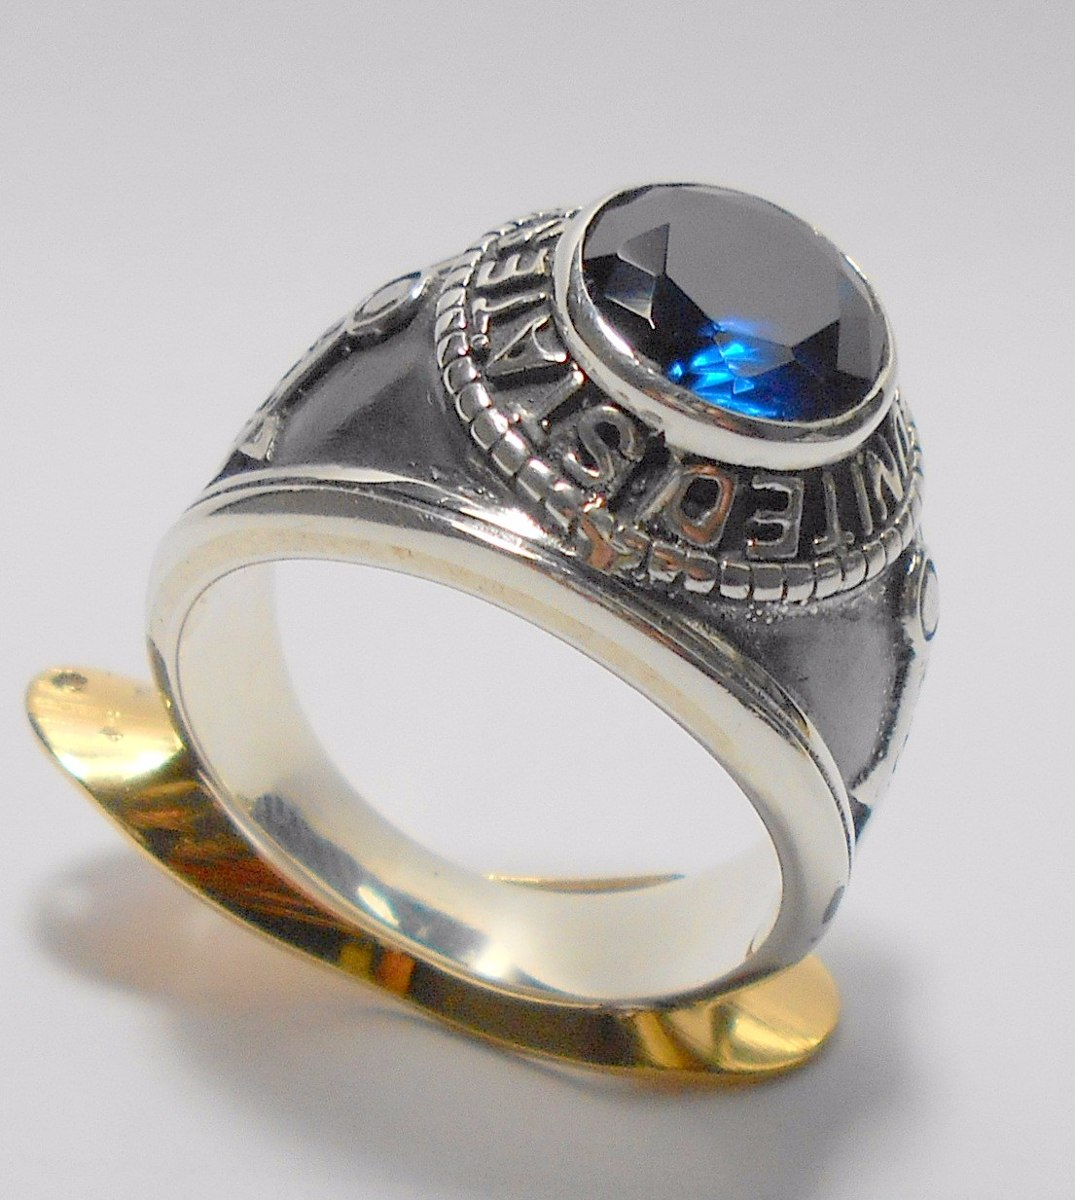 anel prata 950 masculino maçom maçonico americano frete gts. Carregando  zoom. b378038e94